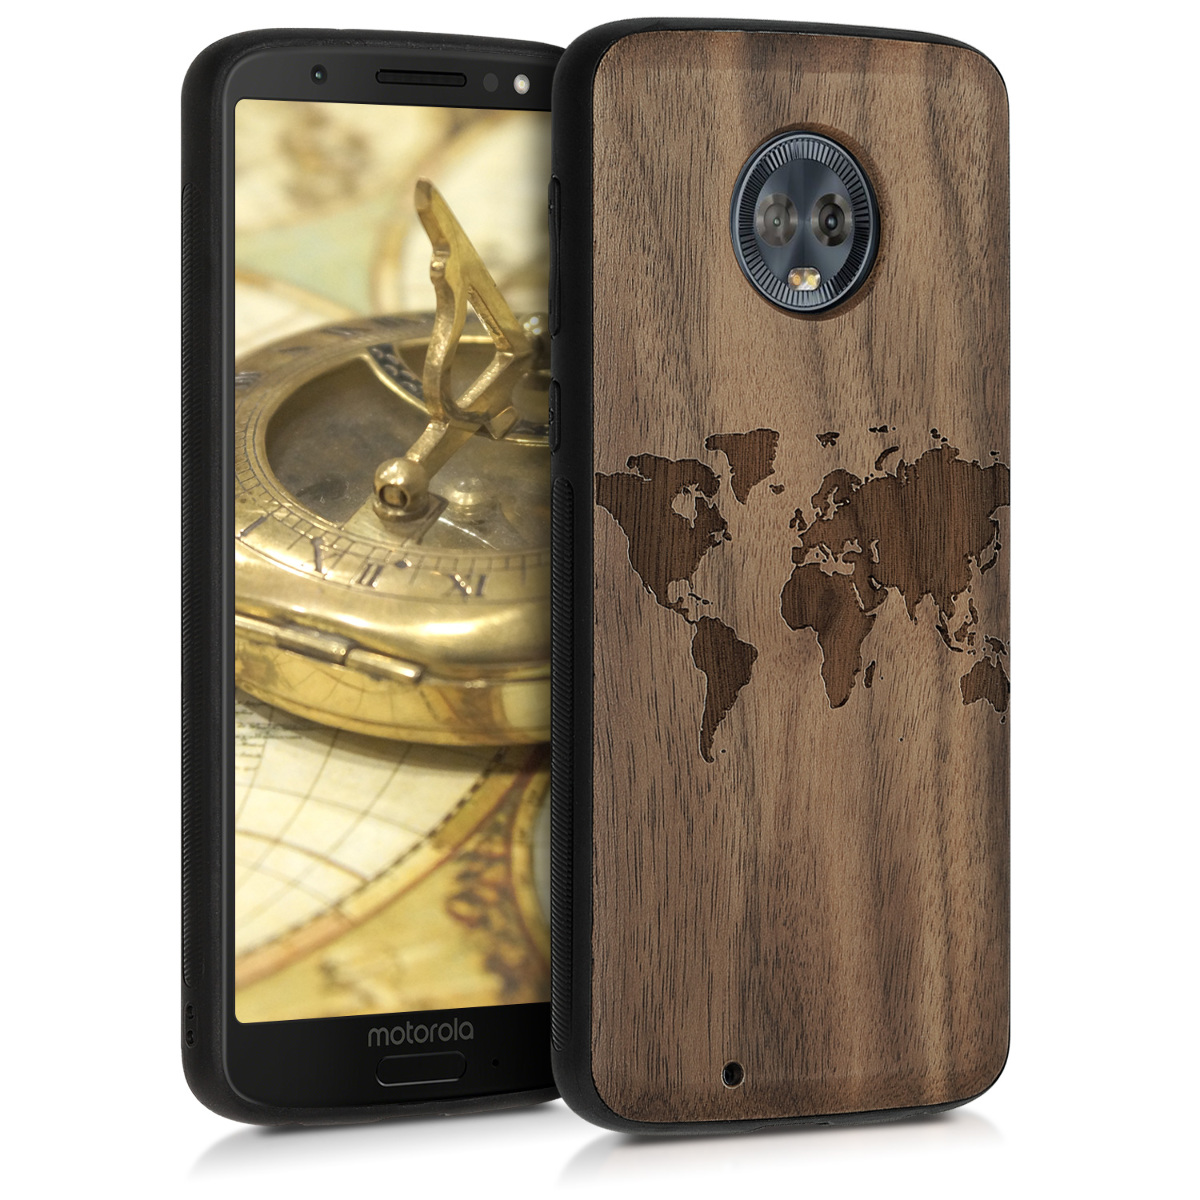 KW Ξύλινη Θήκη Motorola Moto G6 - Παγκόσμιος χάρτης (46716.01)